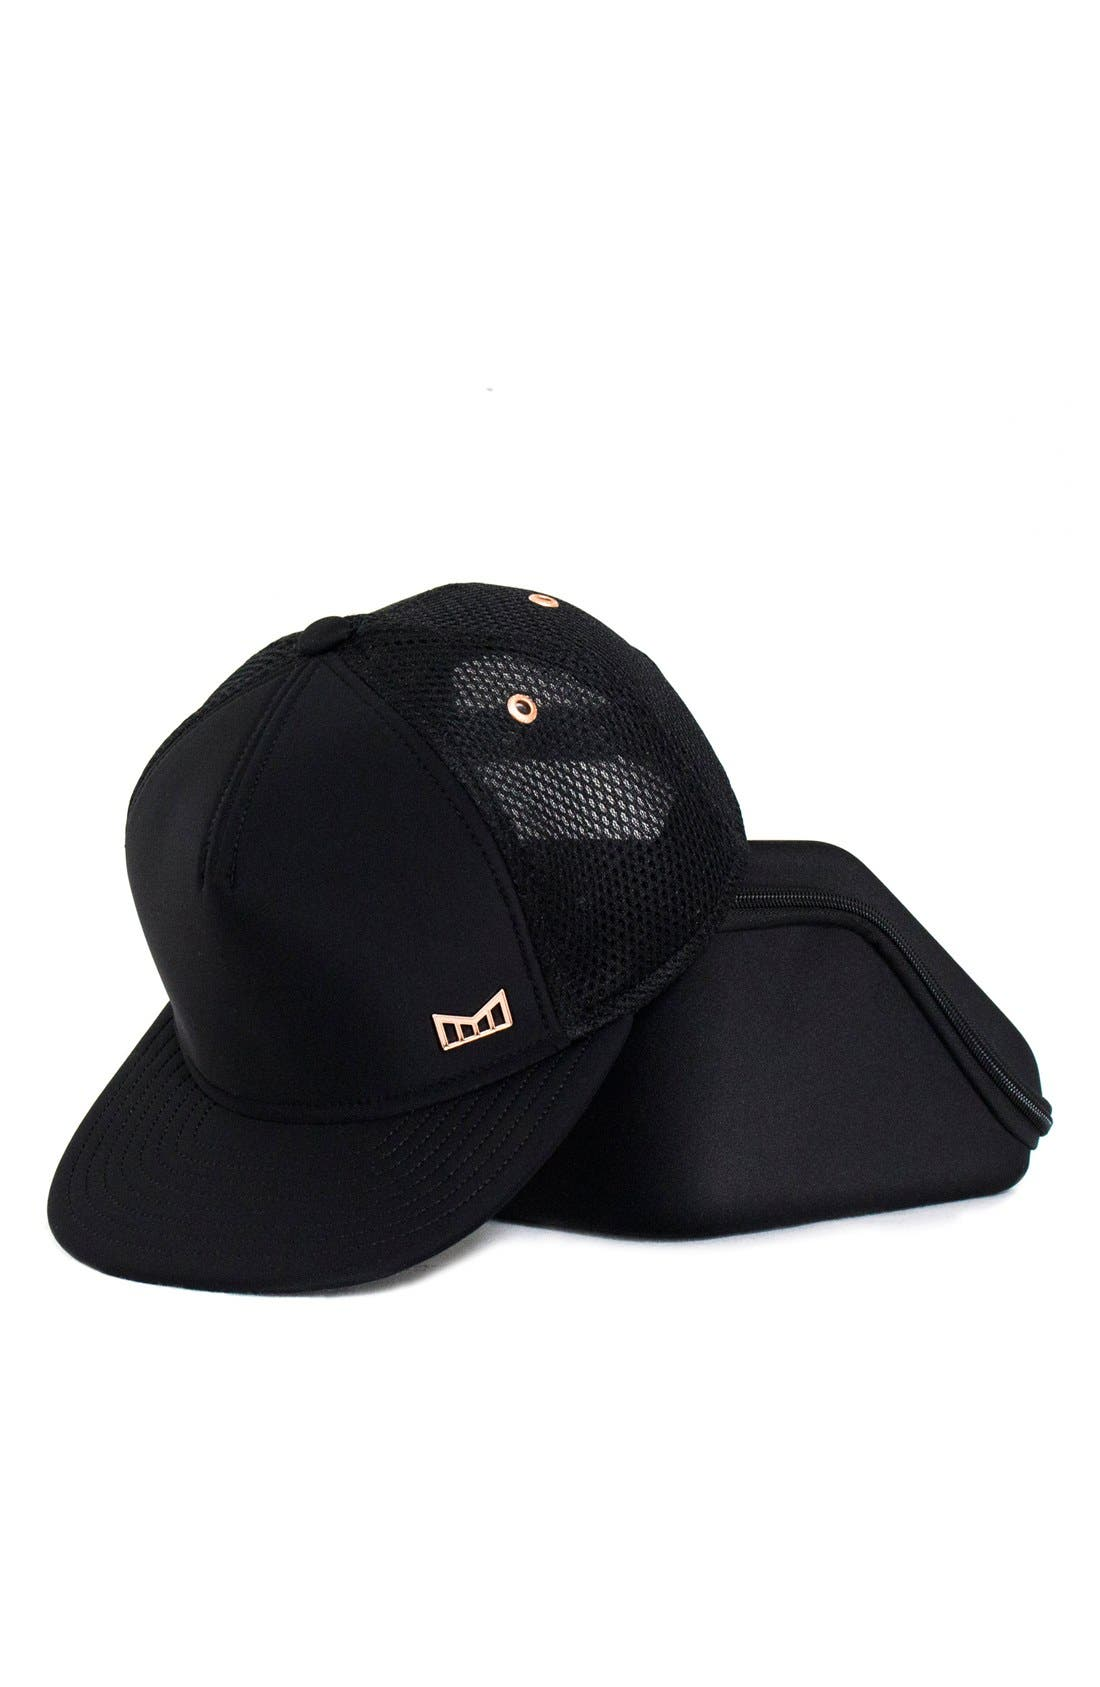 'The Majesty' Mesh Back Snapback Hat,                             Alternate thumbnail 6, color,                             Black